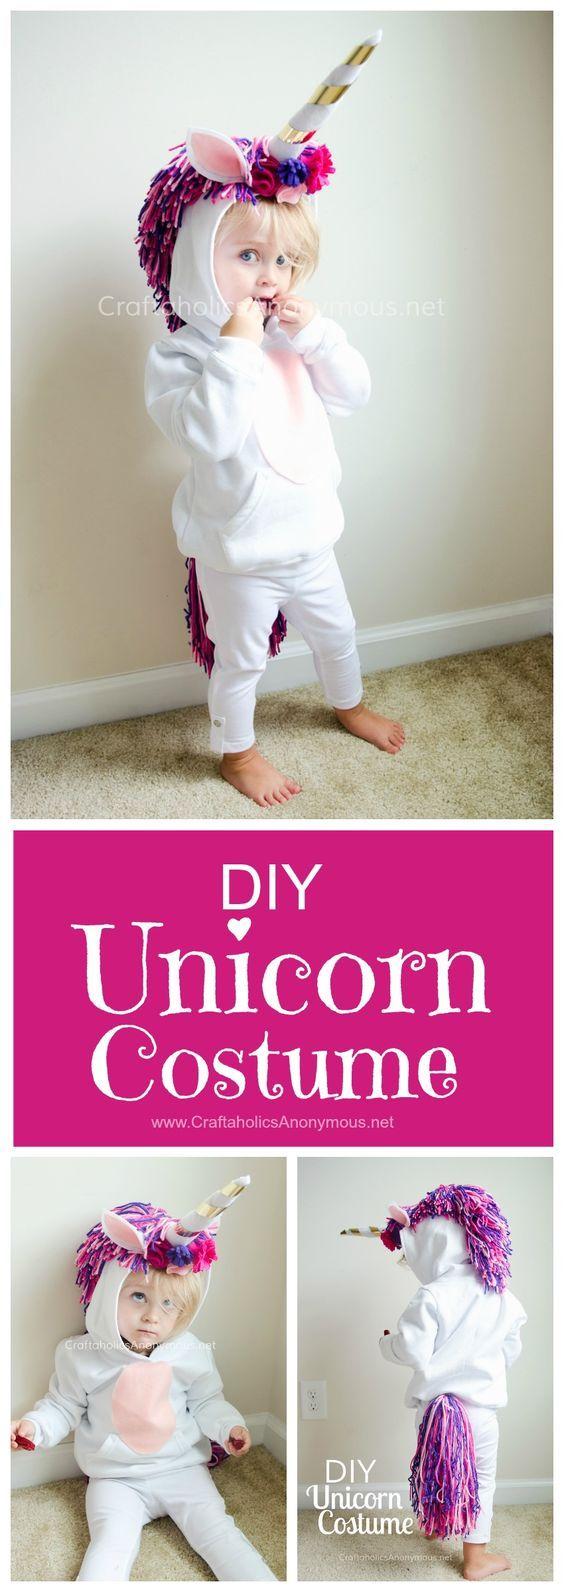 Unicorn Costume DIY Tutorial :: Such a cute handmade Halloween costumes idea for kids!: